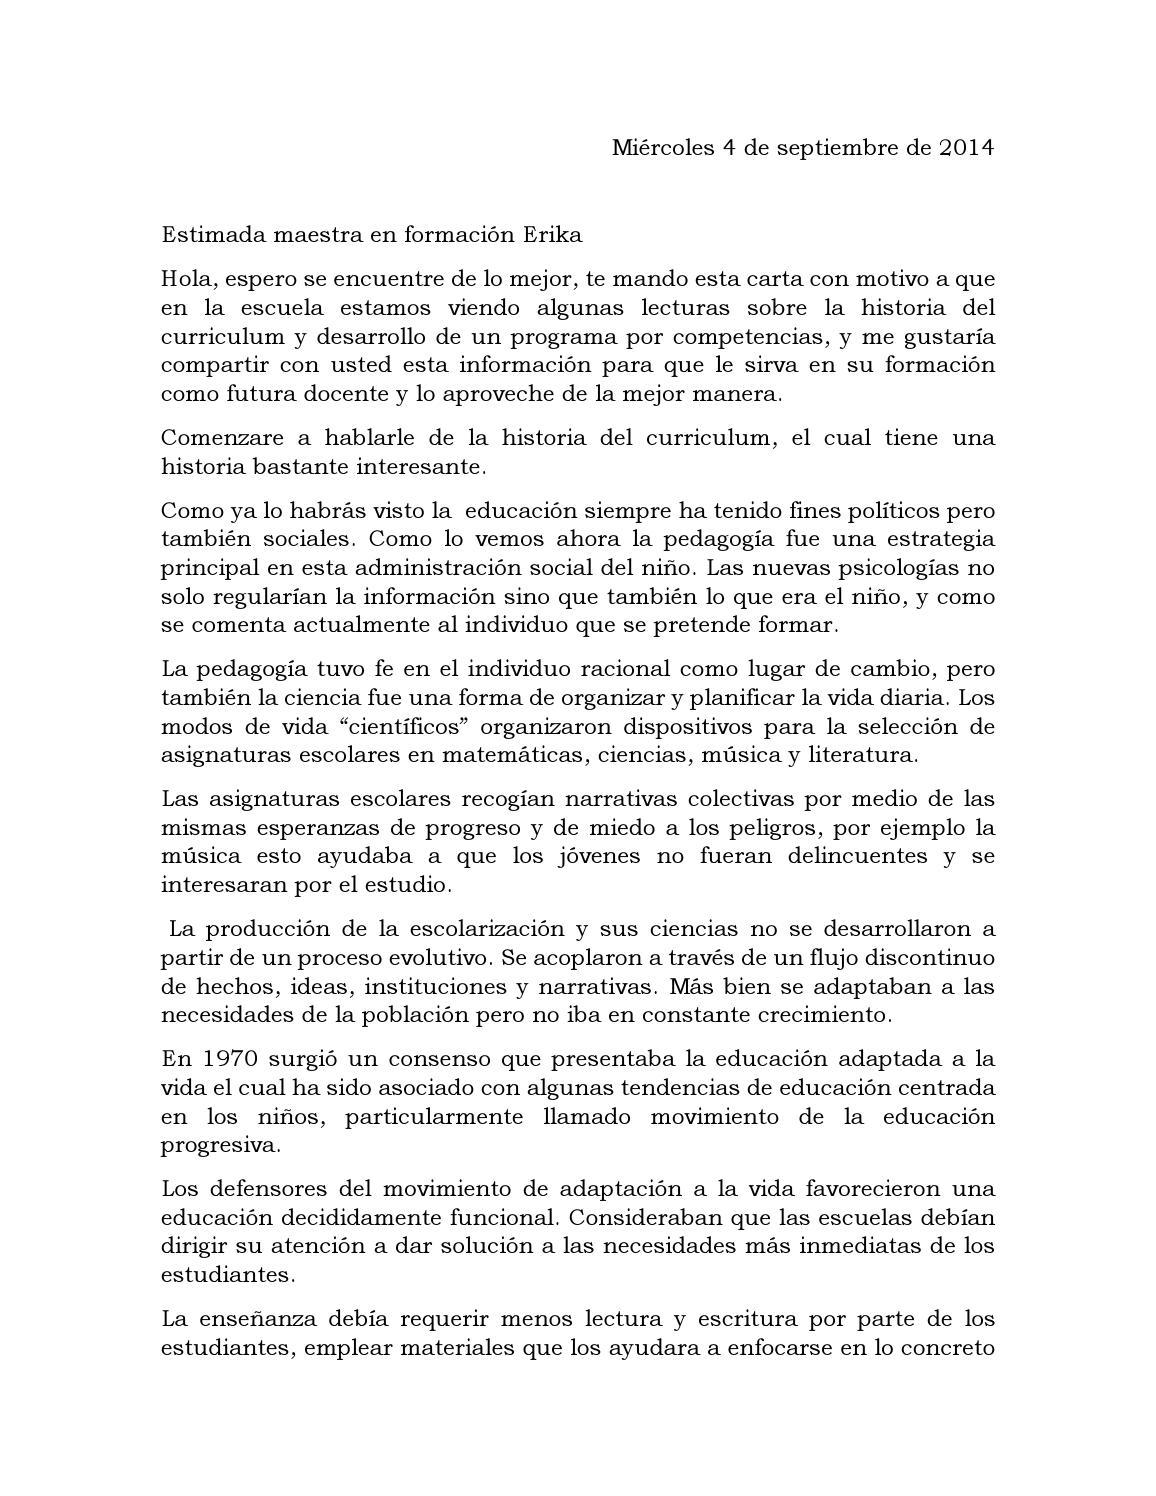 Carta sobre el curriculum by alejandrina - issuu